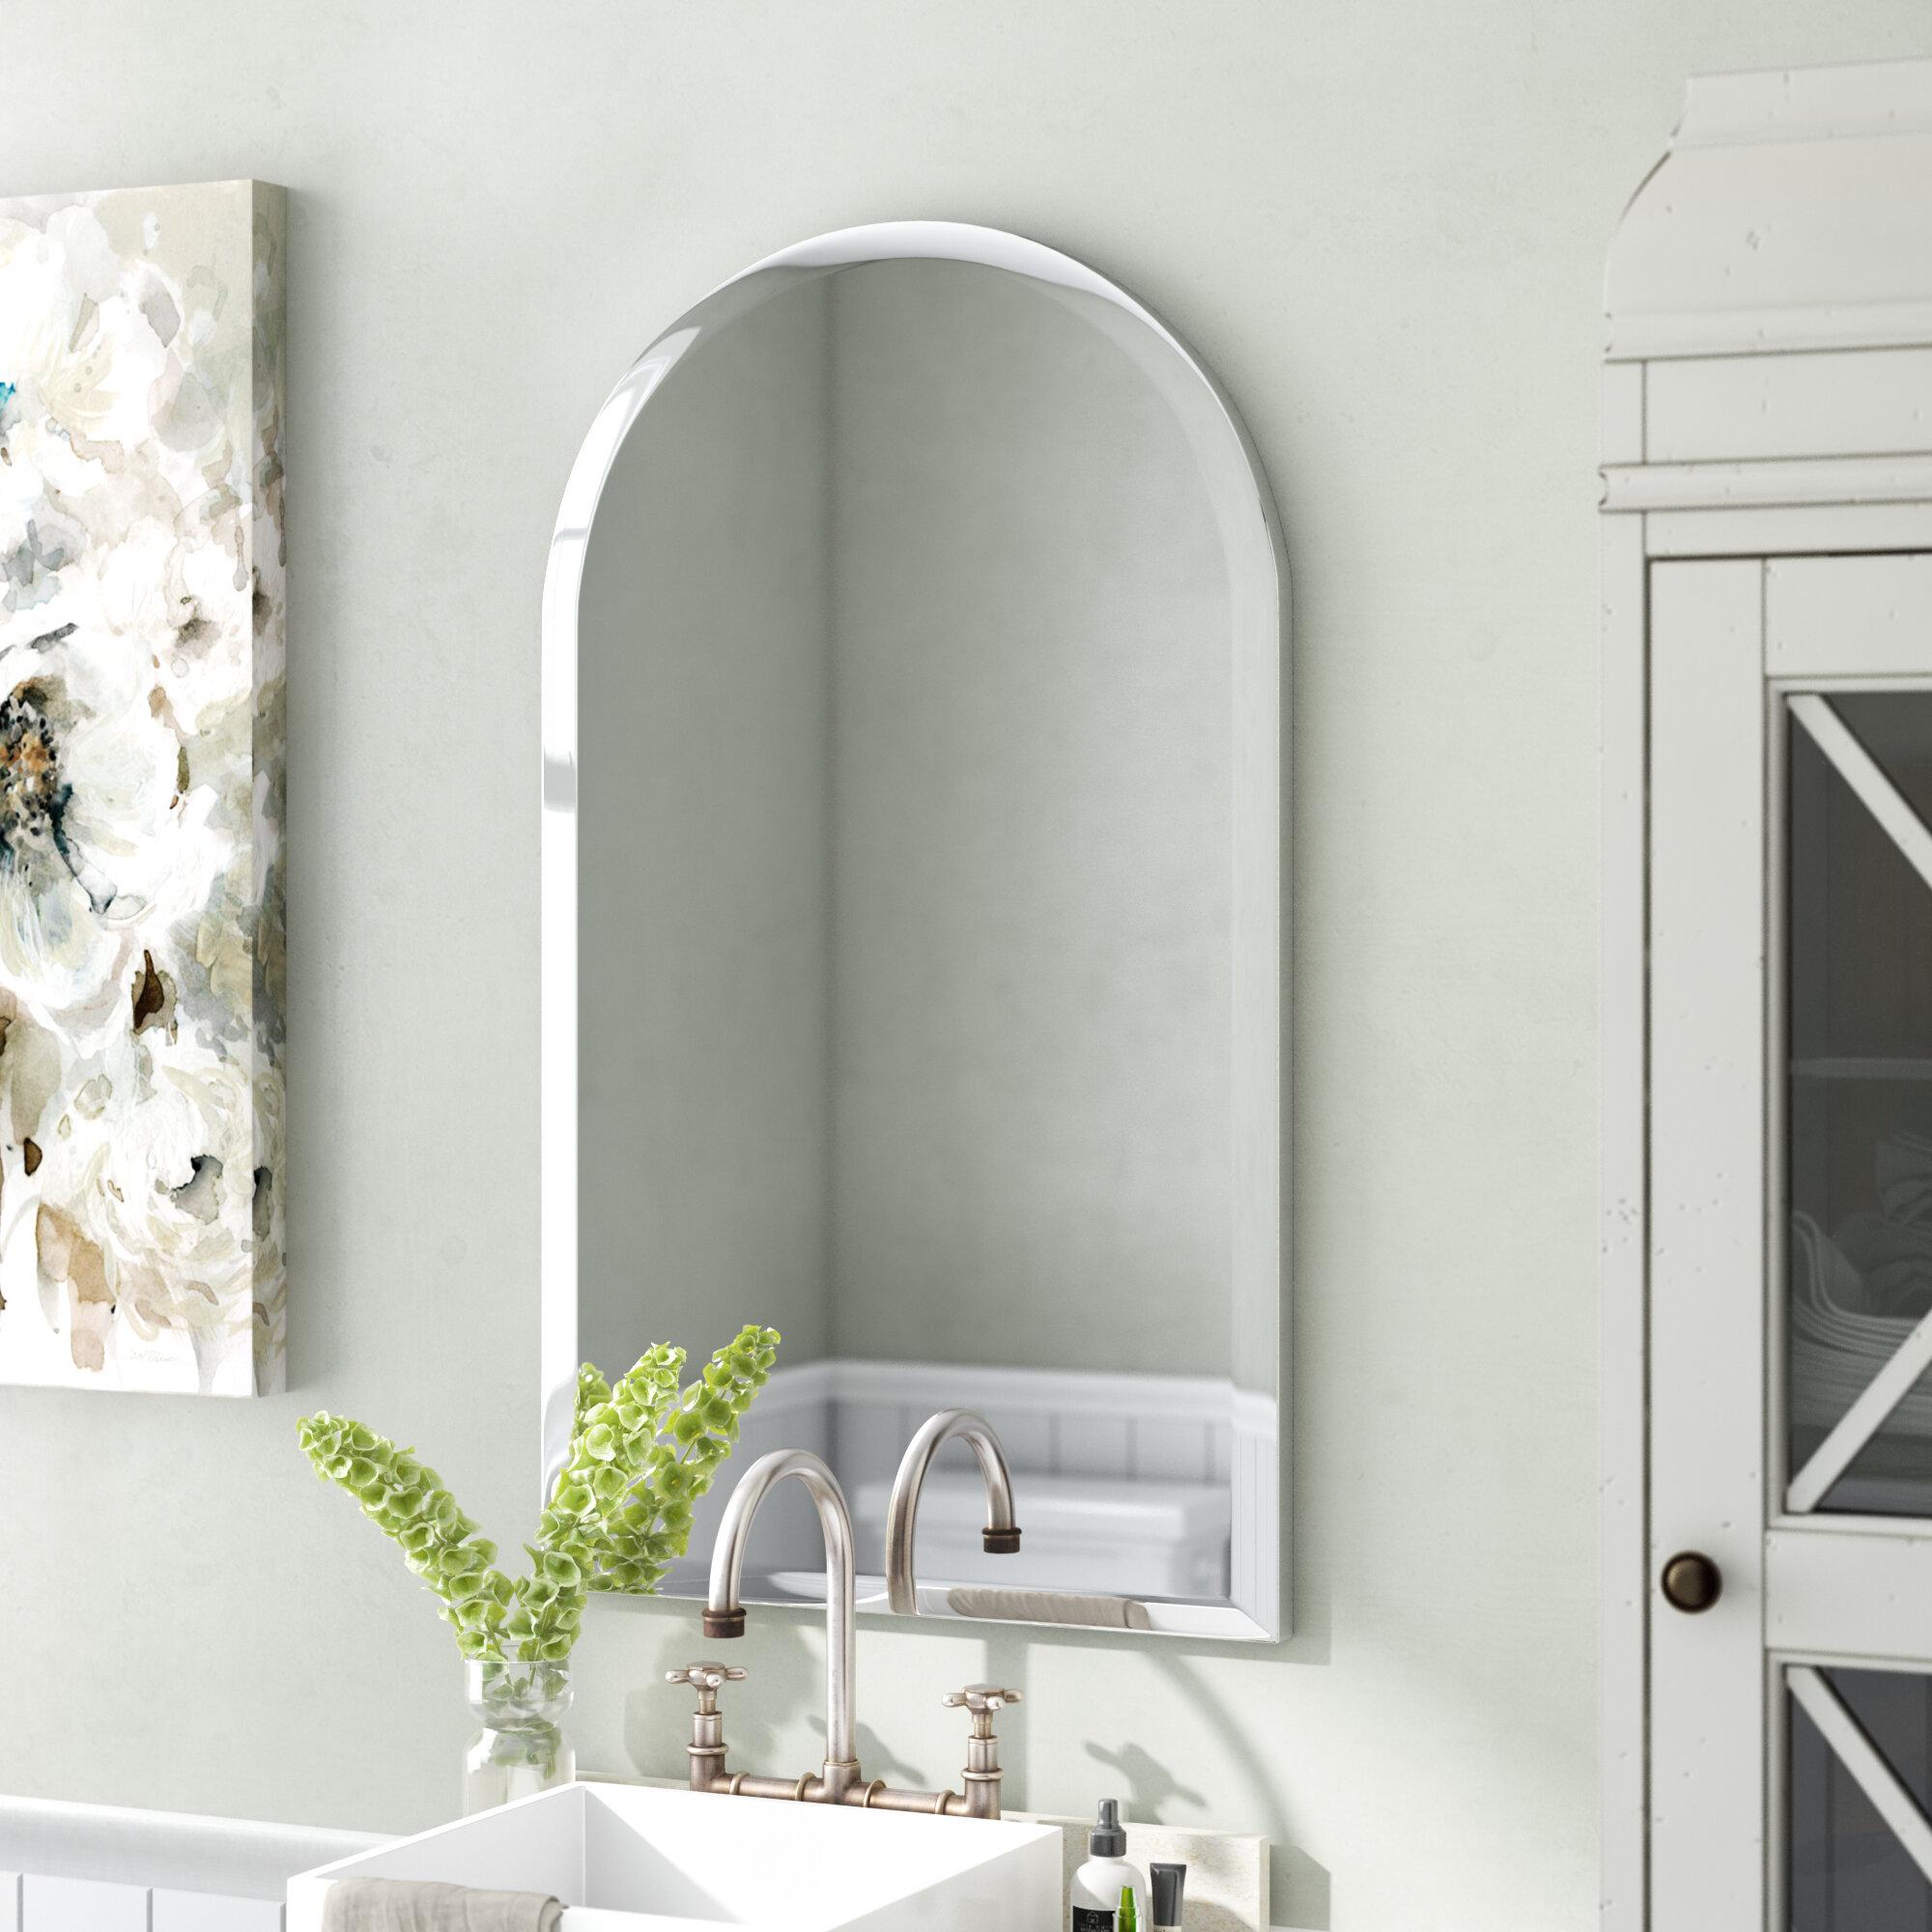 Ivy Bronx Huguley Frameless Arched Wall Mirror Reviews Wayfair